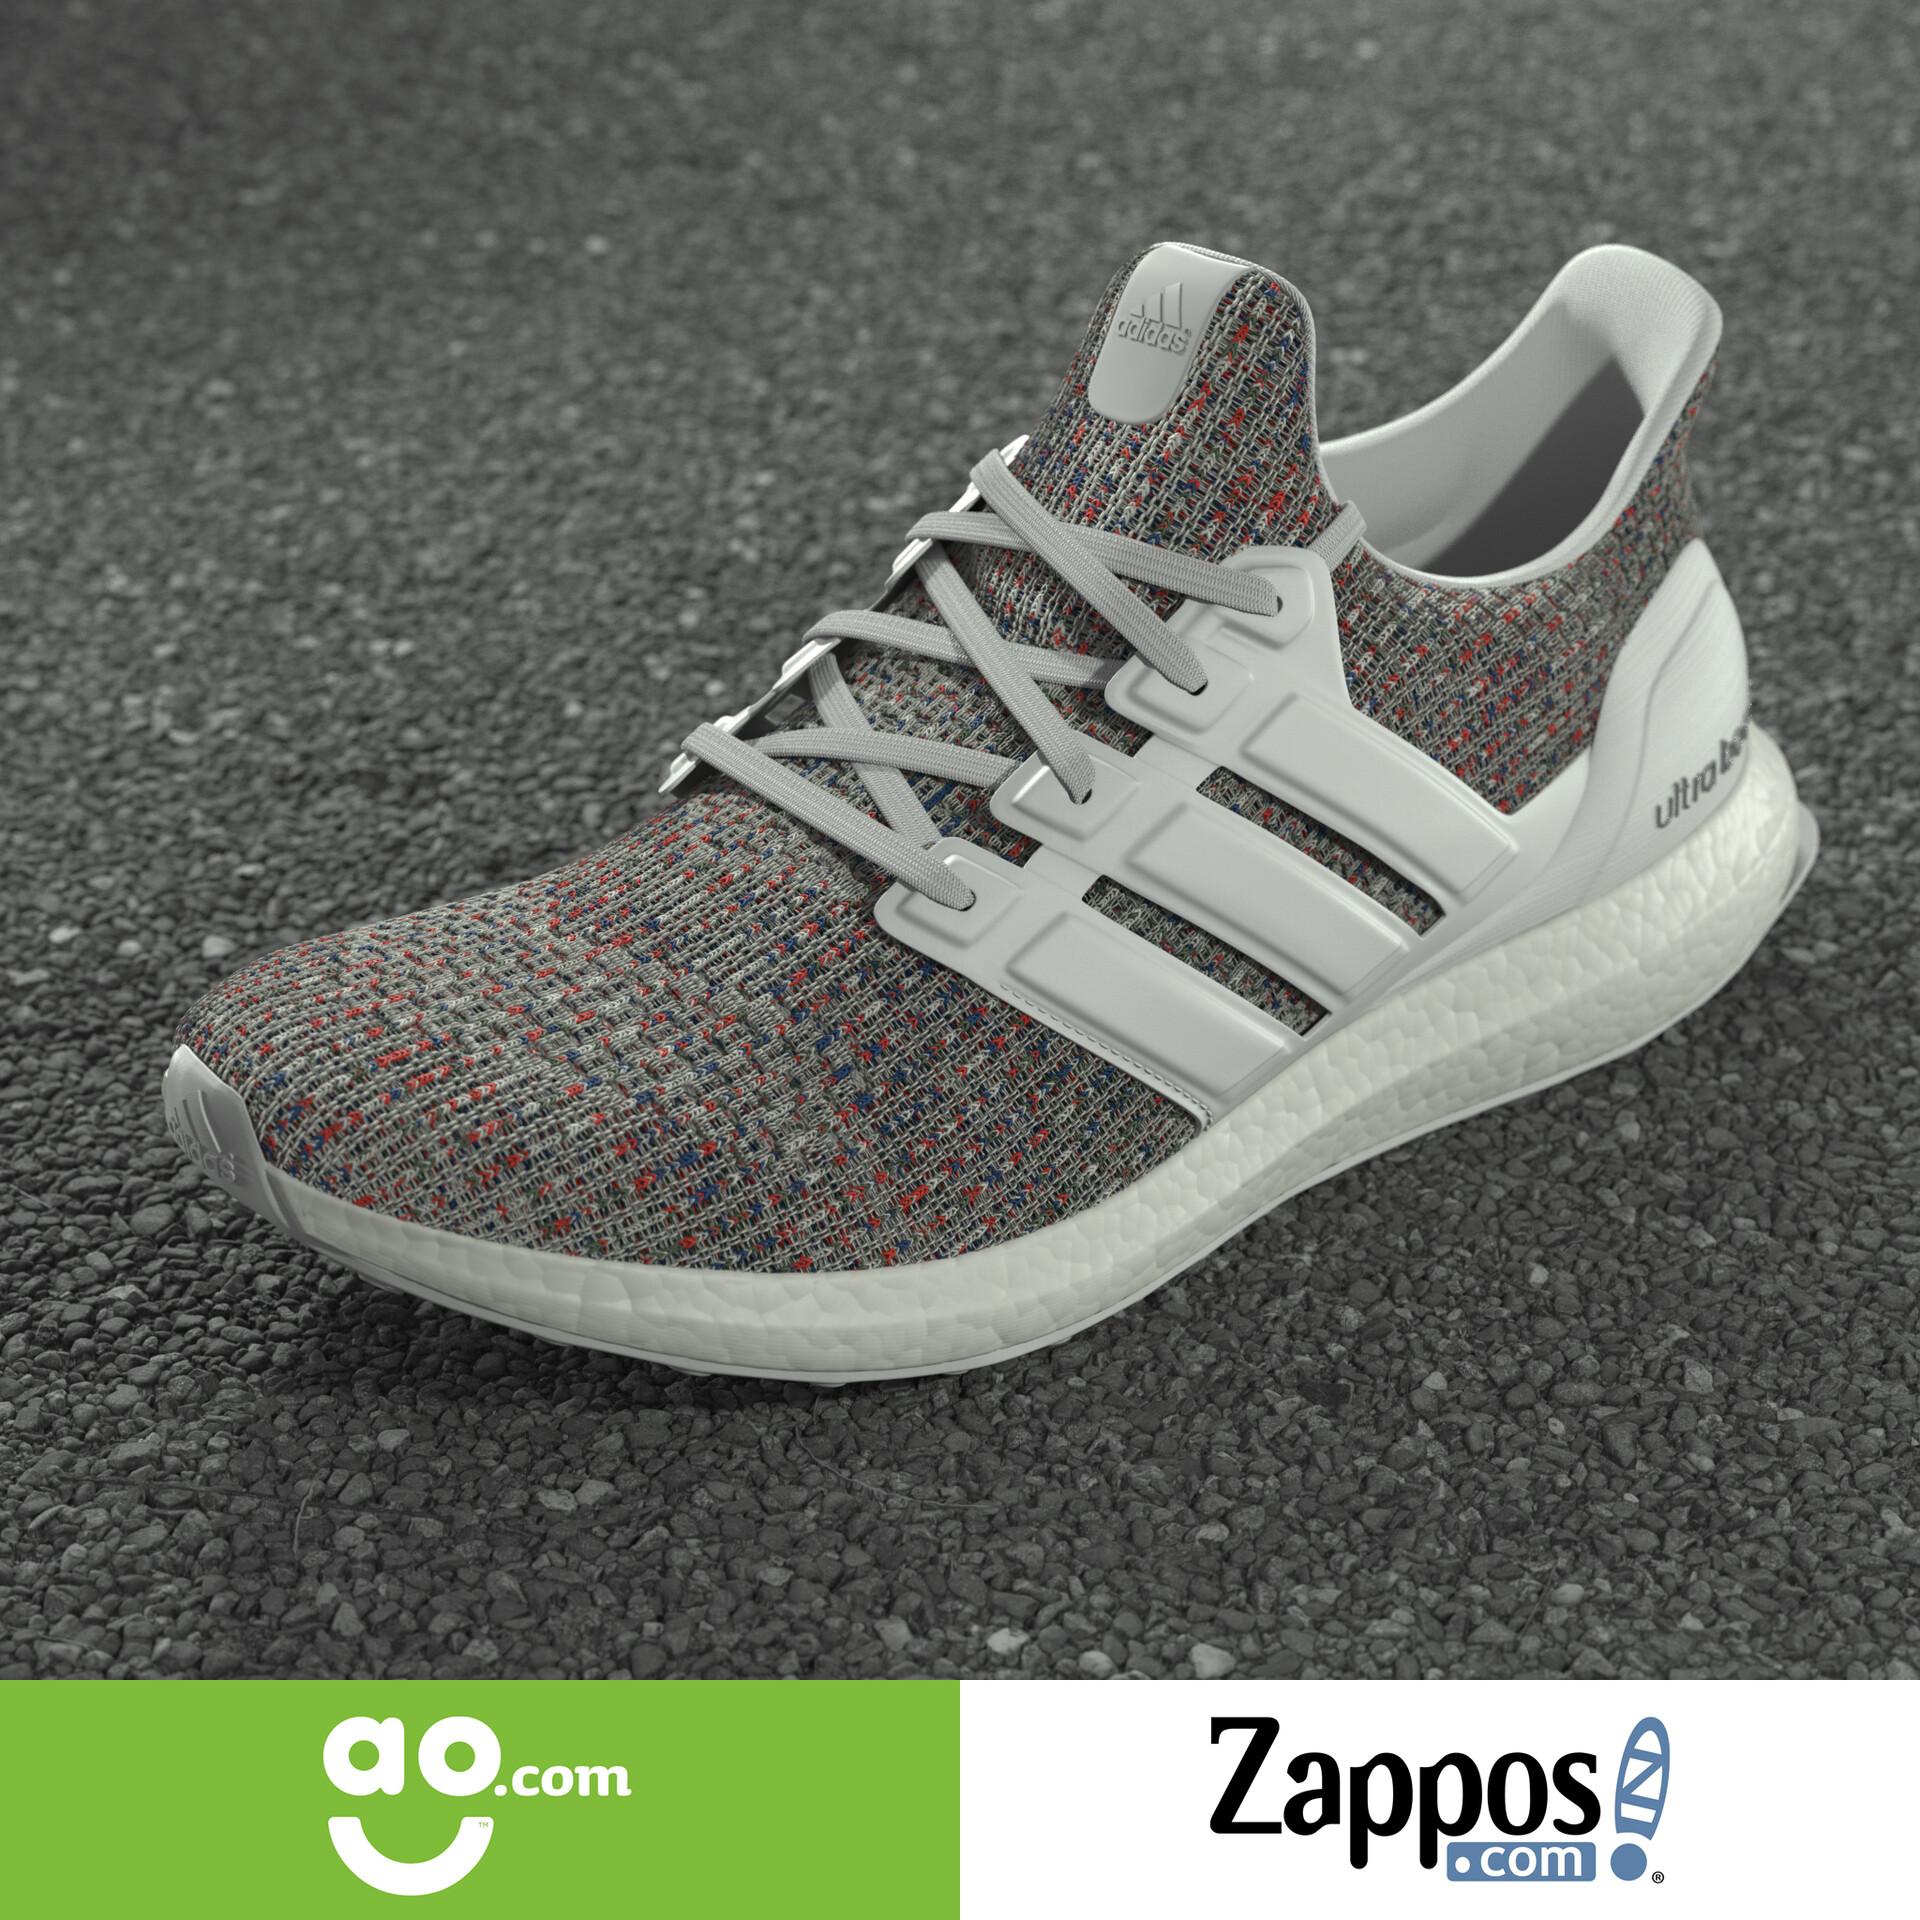 ArtStation Adidas Ultraboost: Product Visualisation